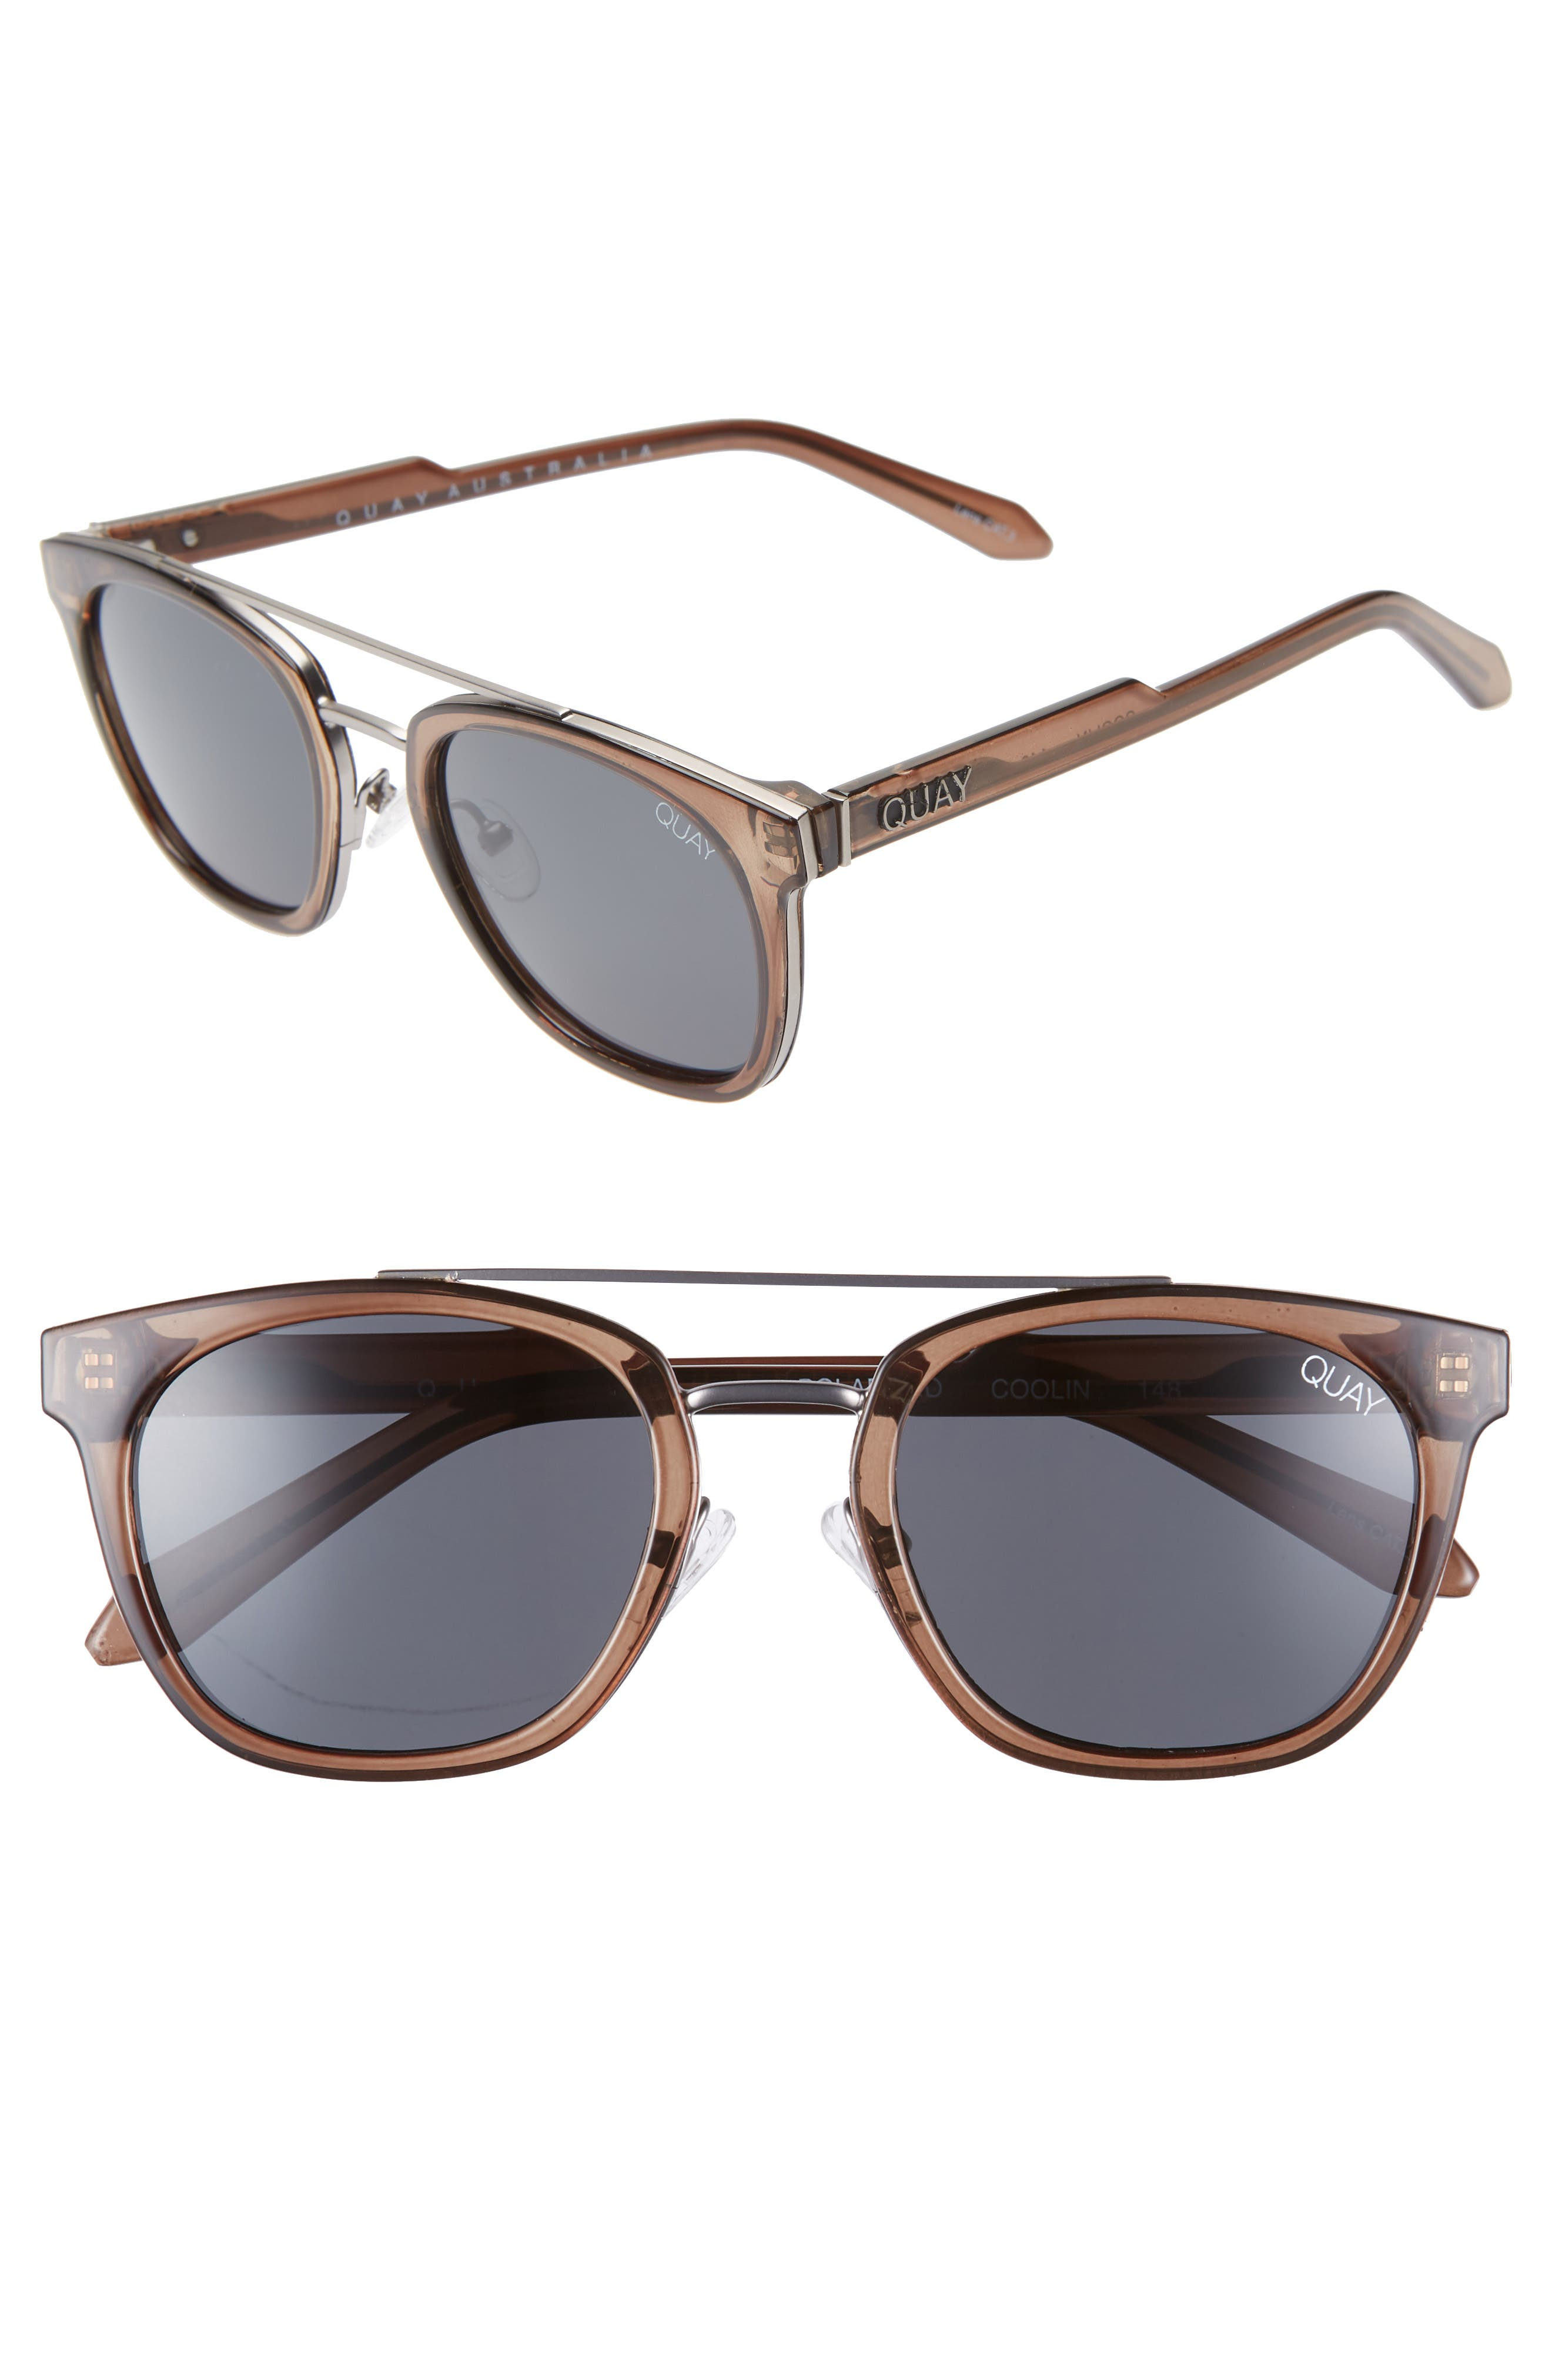 Quay Australia Coolin 51Mm Polarized Sunglasses - Olive/ Smoke